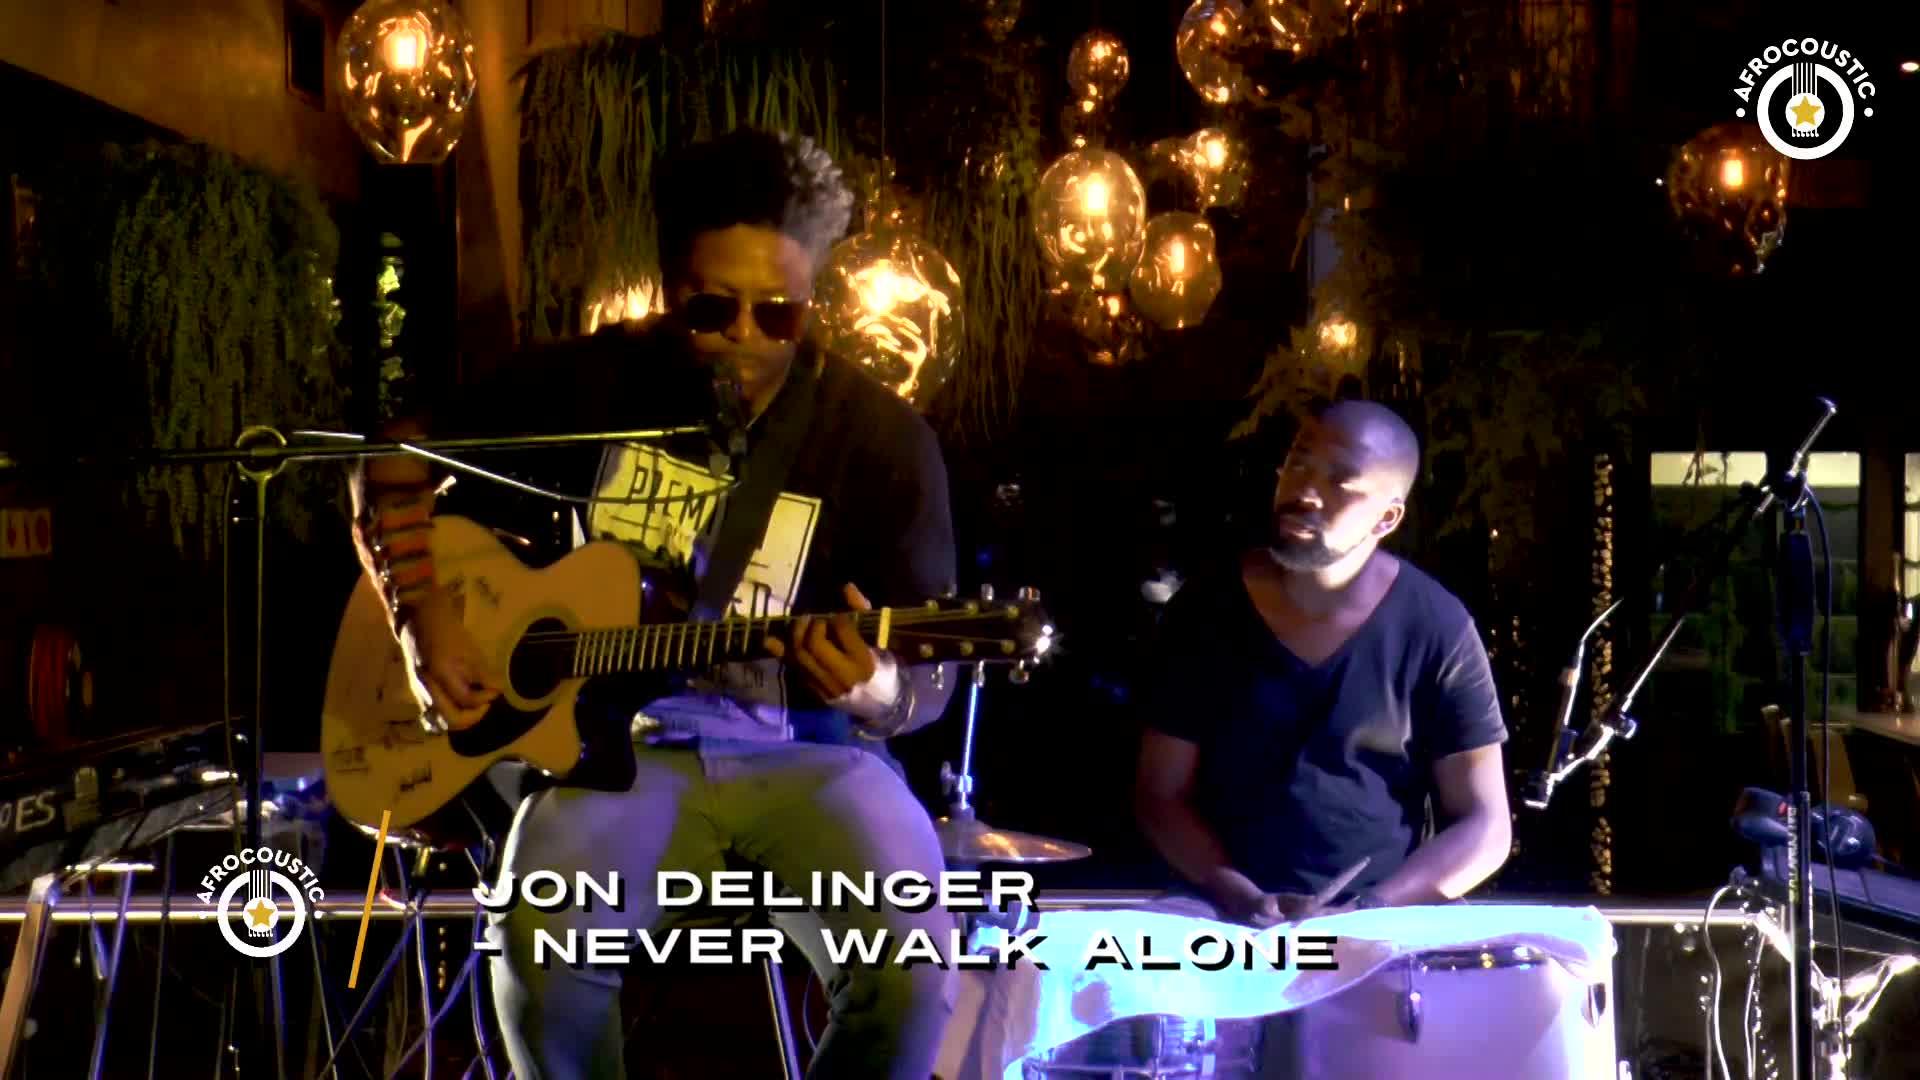 Afrocoustic - Jon Delinger - Never Walk Alone